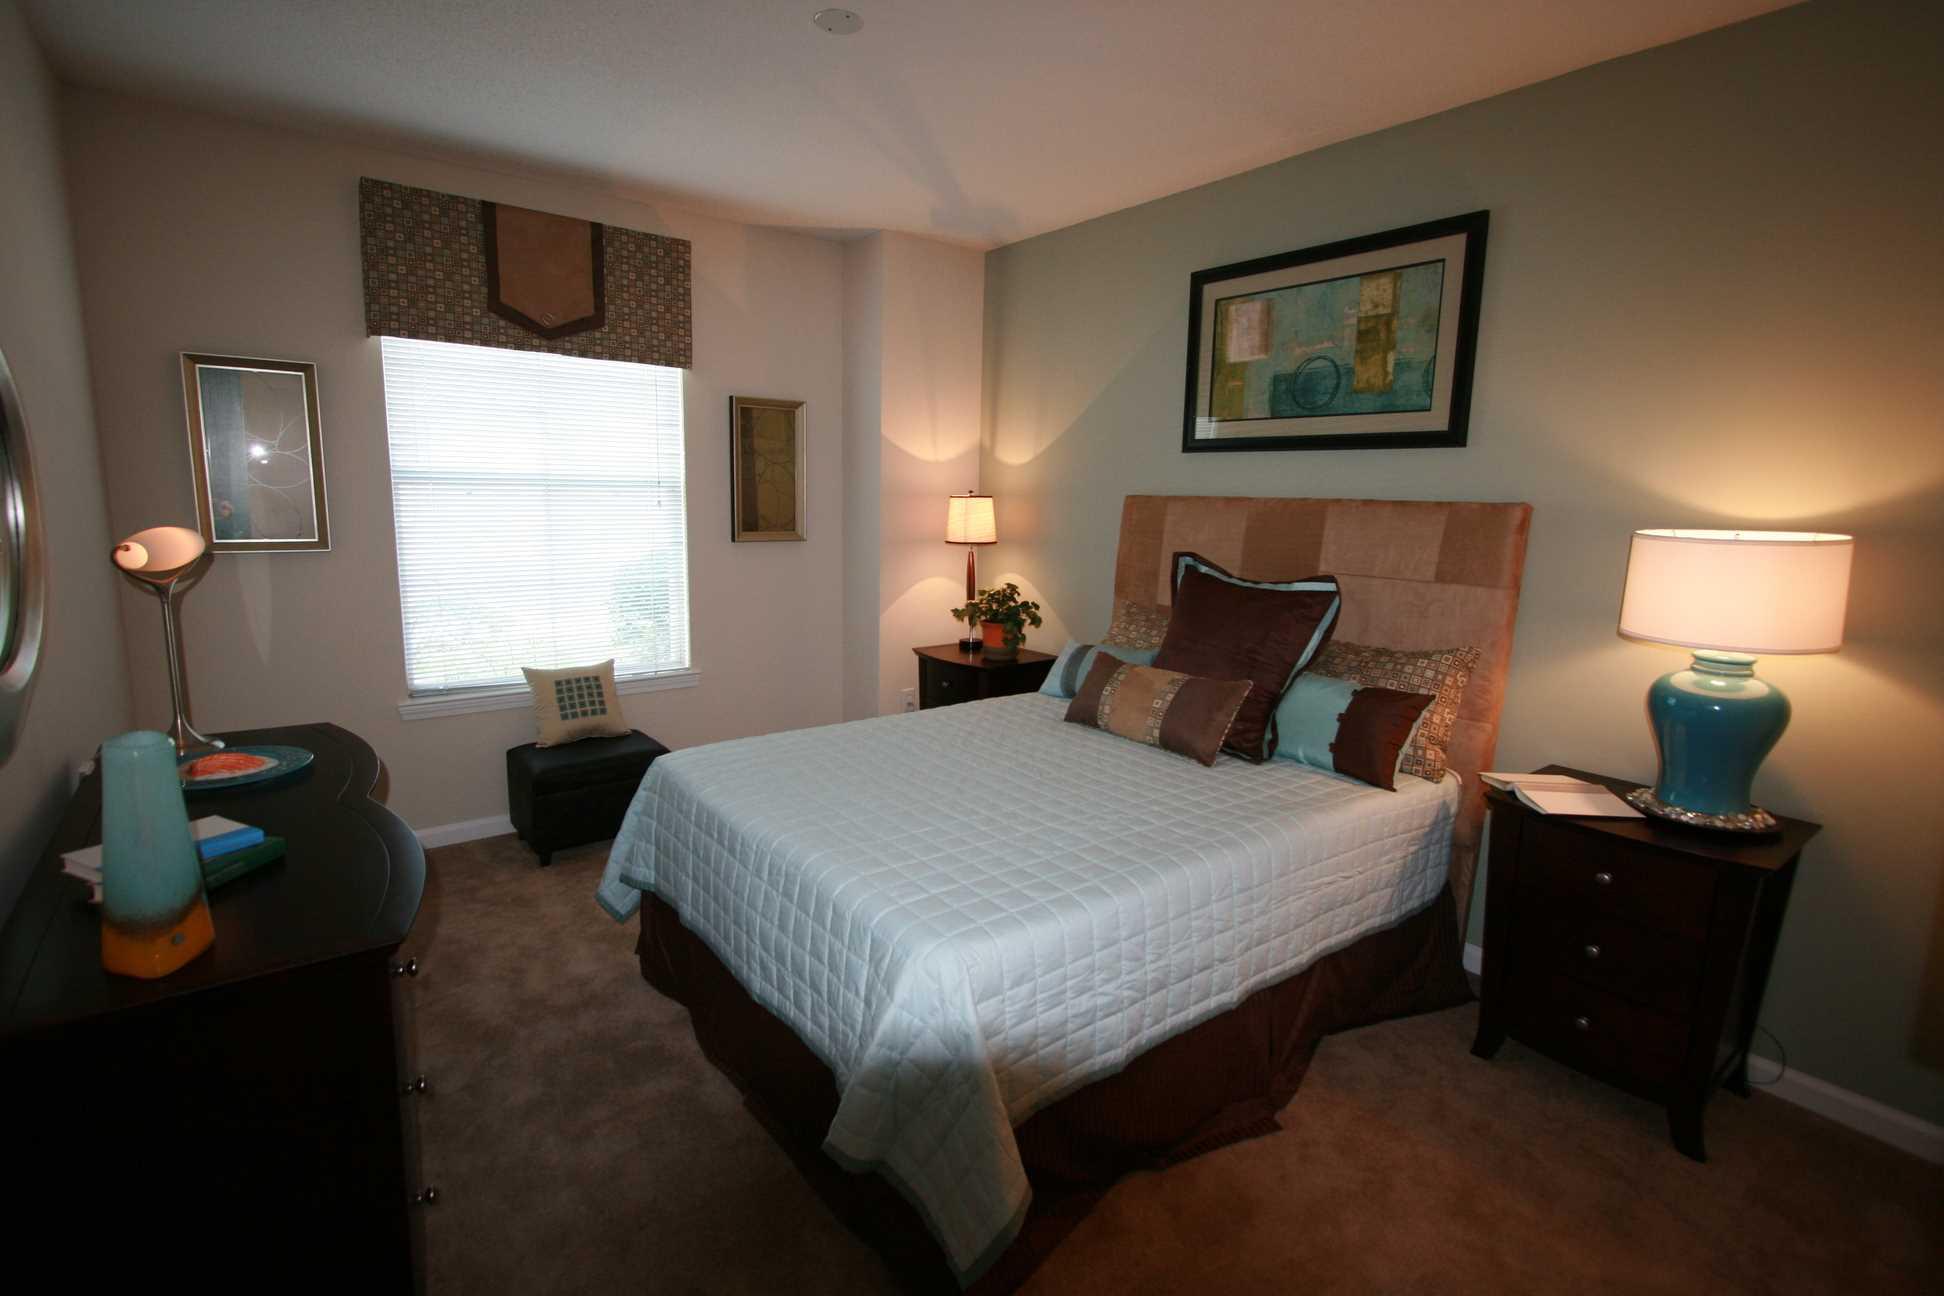 Anzio Apartments Reviews